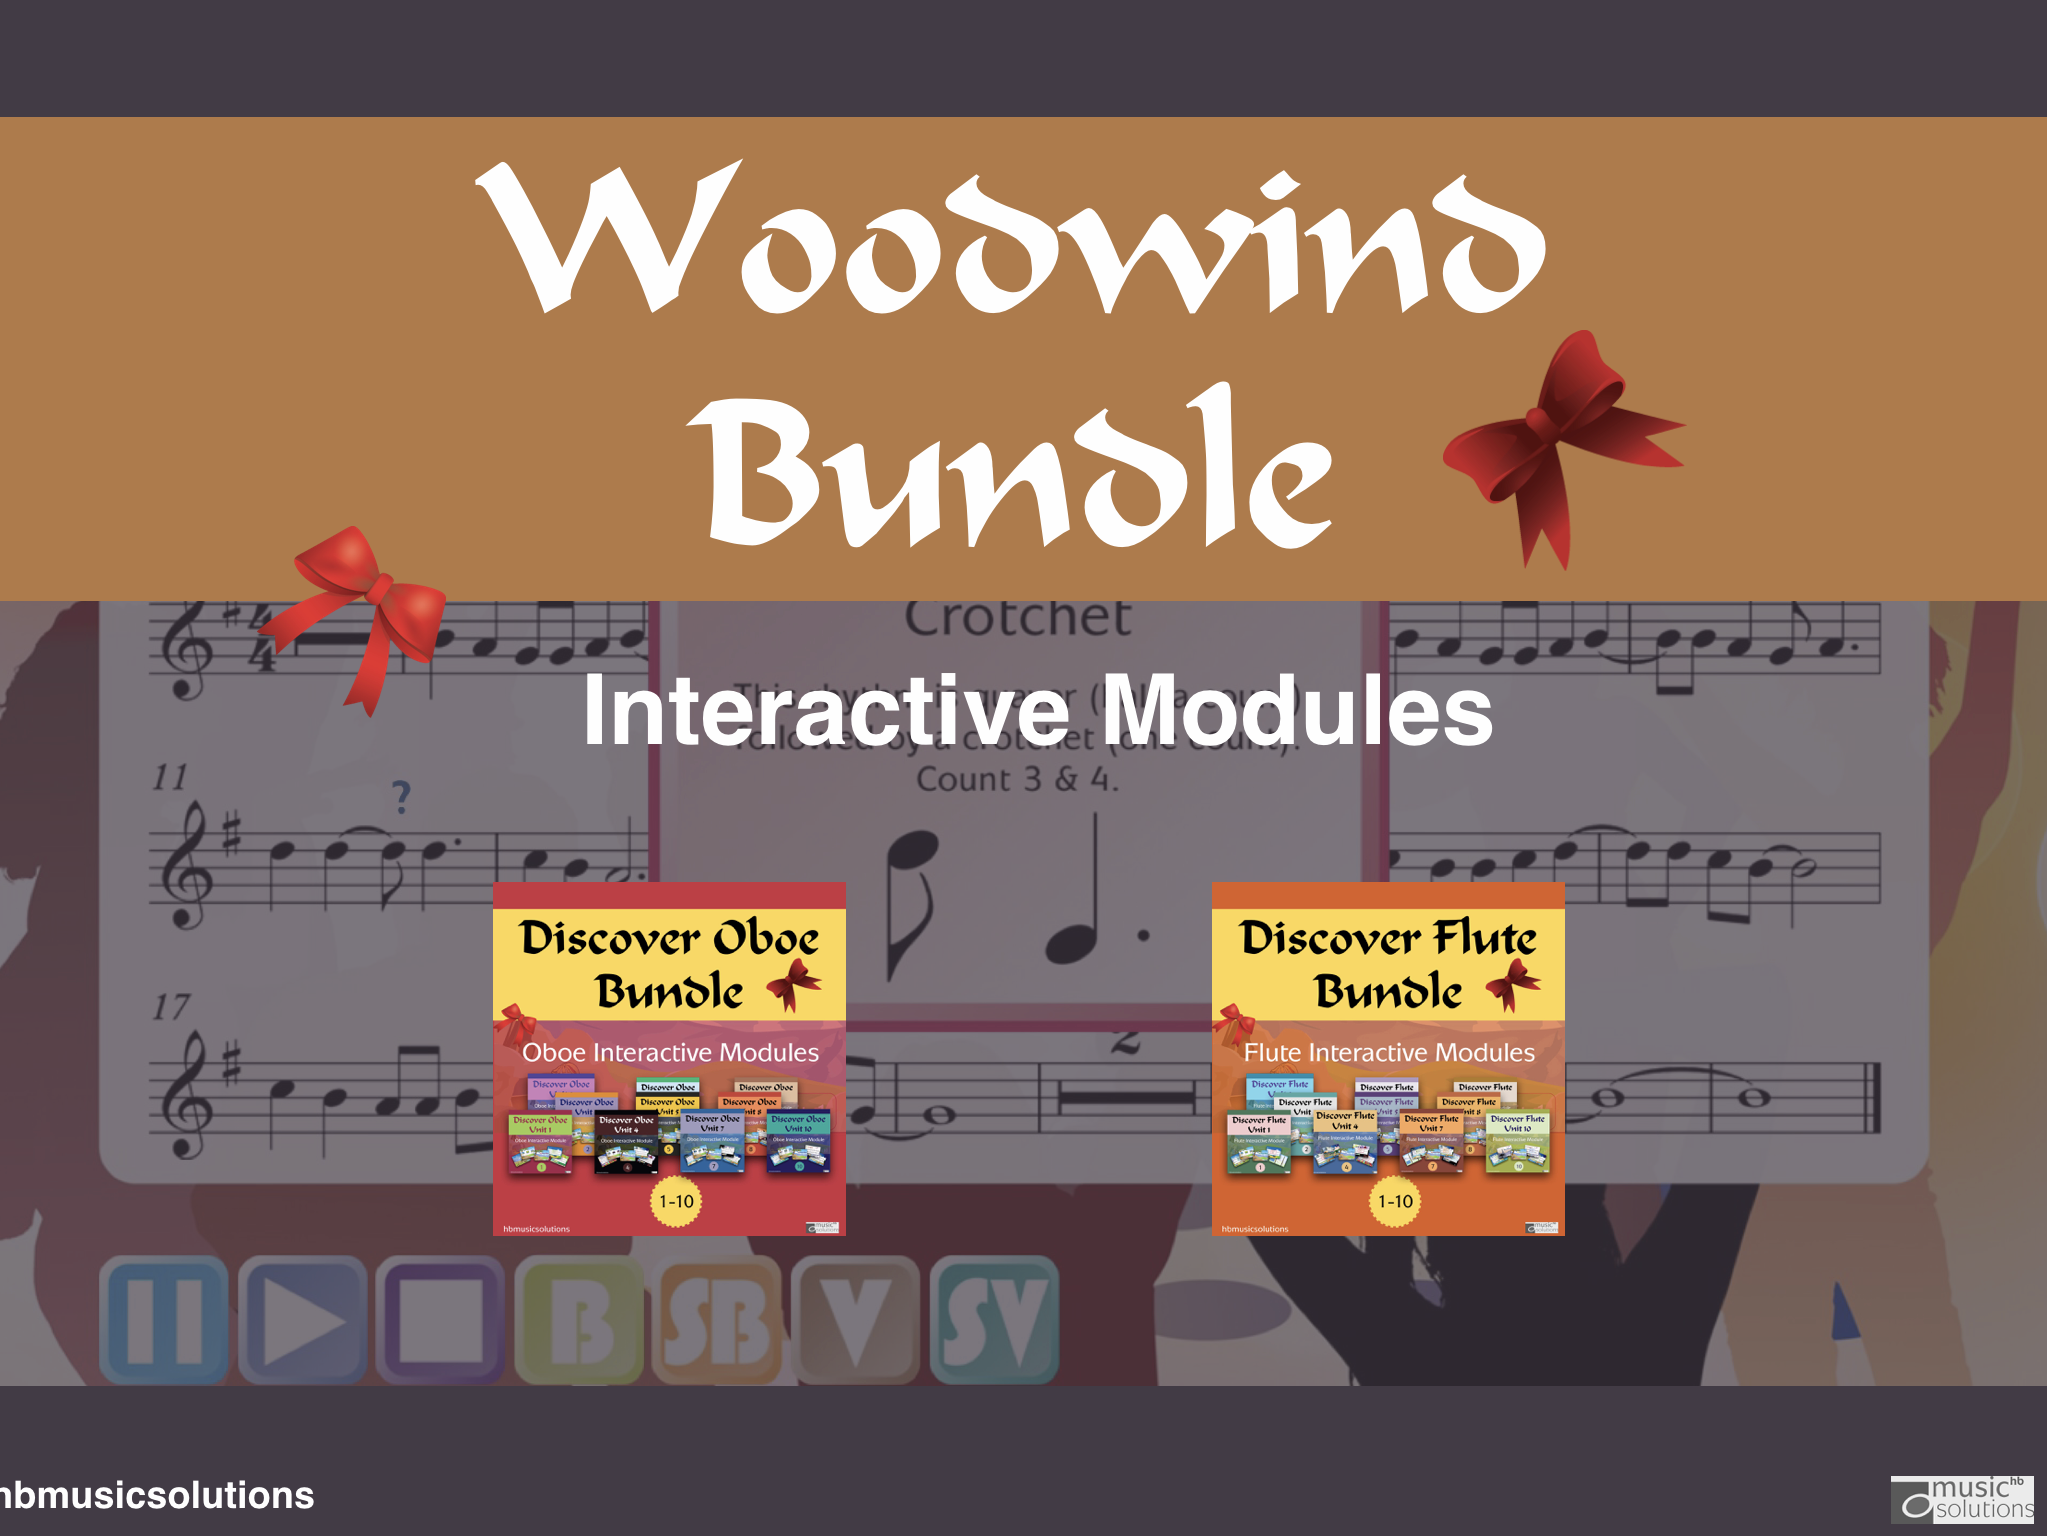 Woodwind  Music Discover Bundle